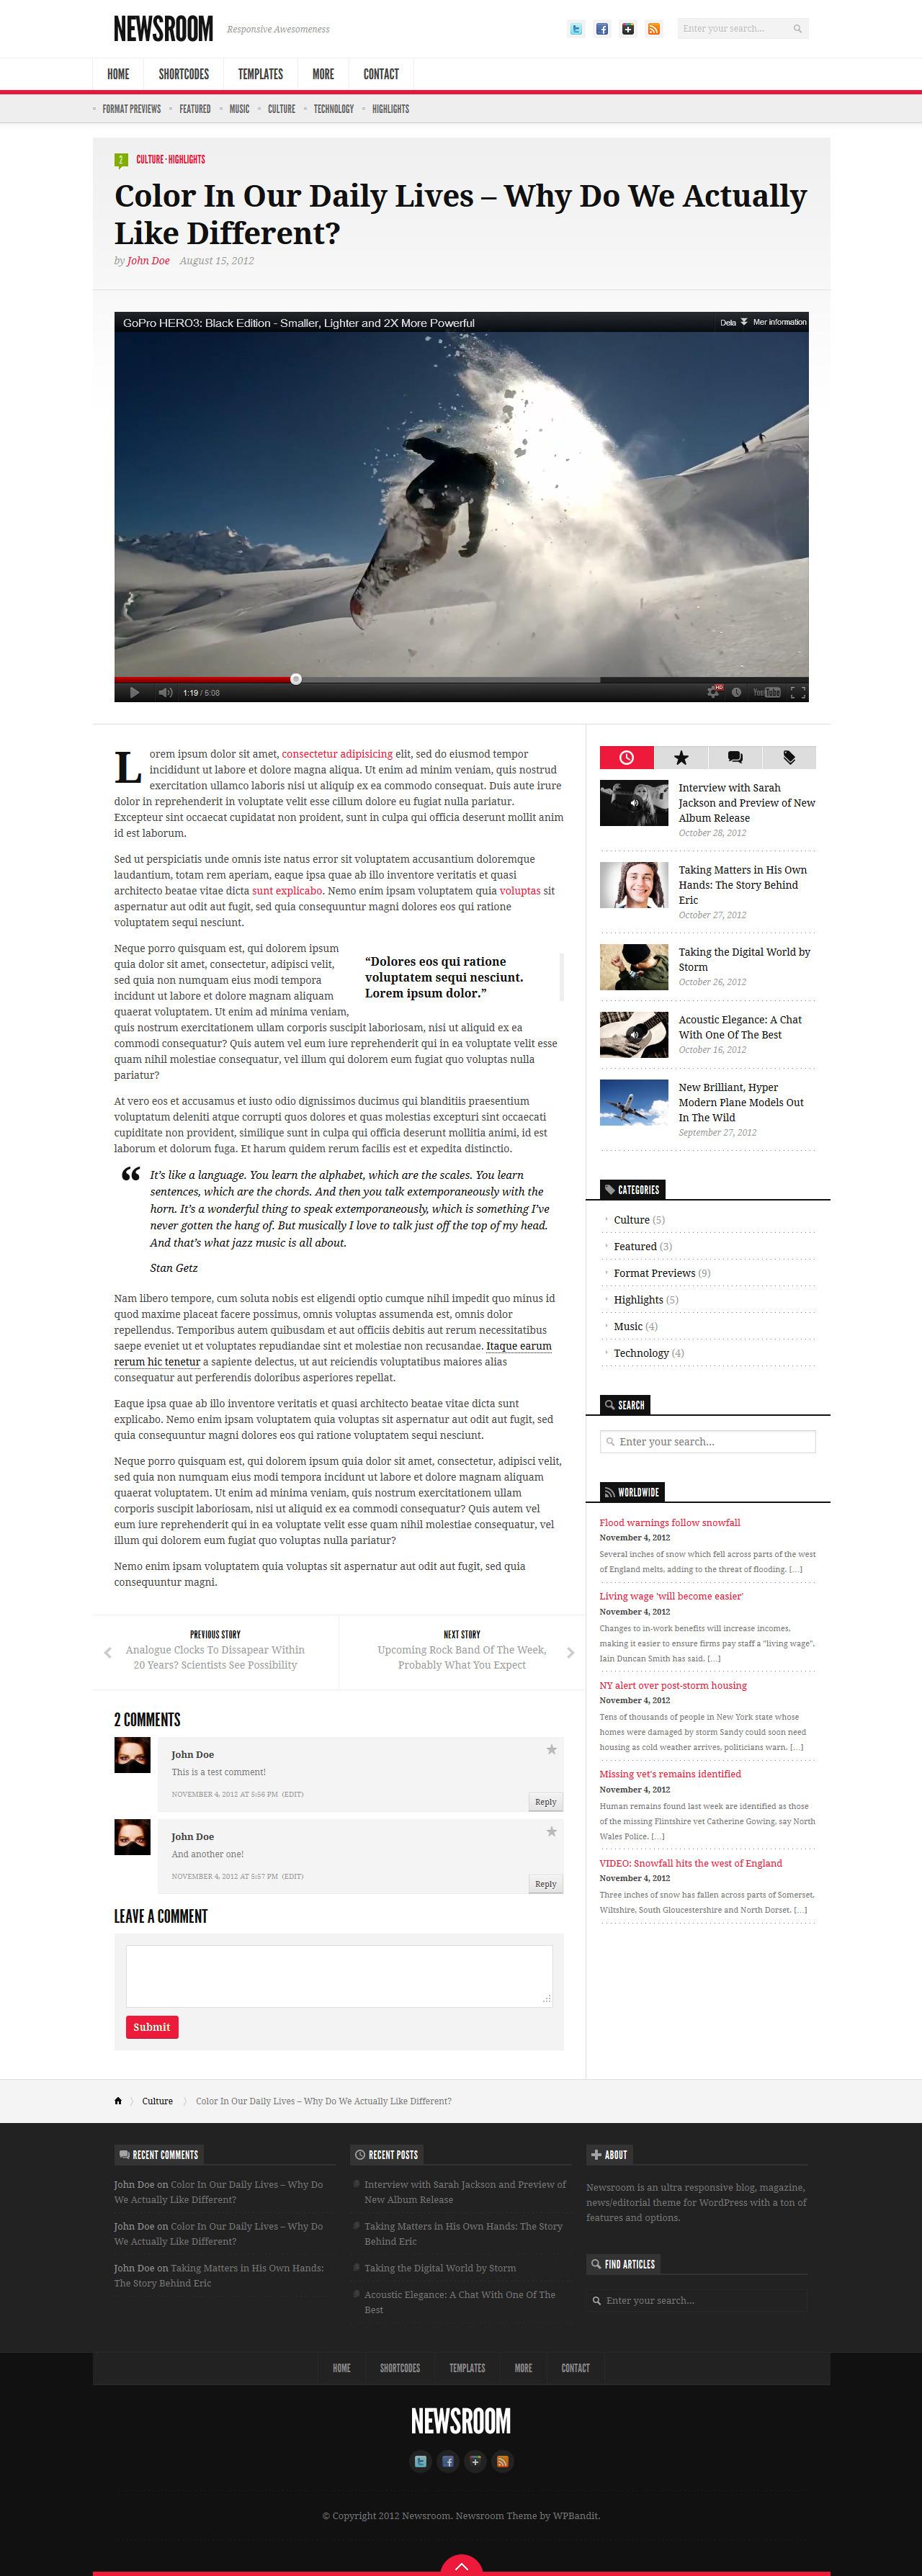 Newsroom - Responsive News & Magazine Theme